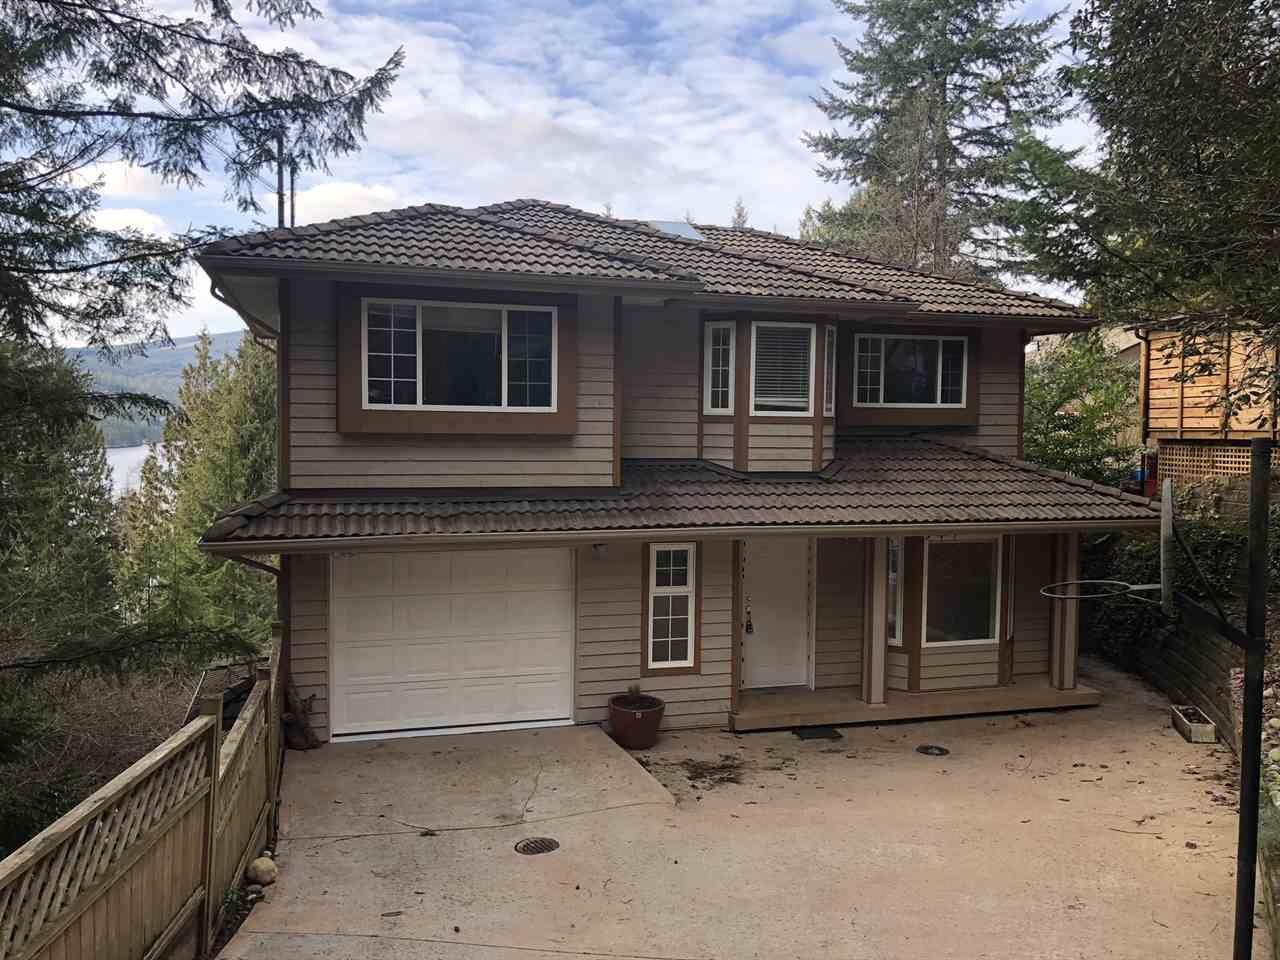 "Main Photo: 7035 SKANA Crescent in Sechelt: Sechelt District House for sale in ""SANDY HOOK"" (Sunshine Coast)  : MLS®# R2430175"